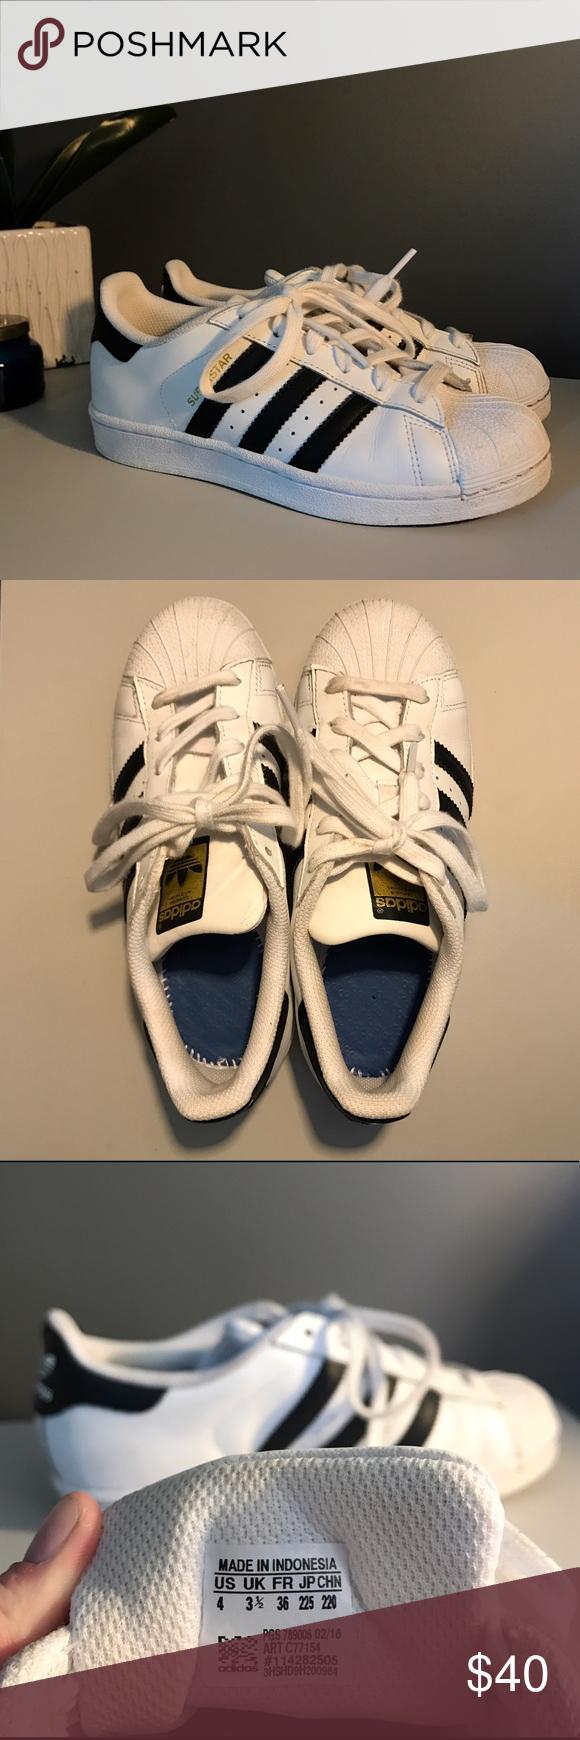 adidas superstars junior size 4 63537674a